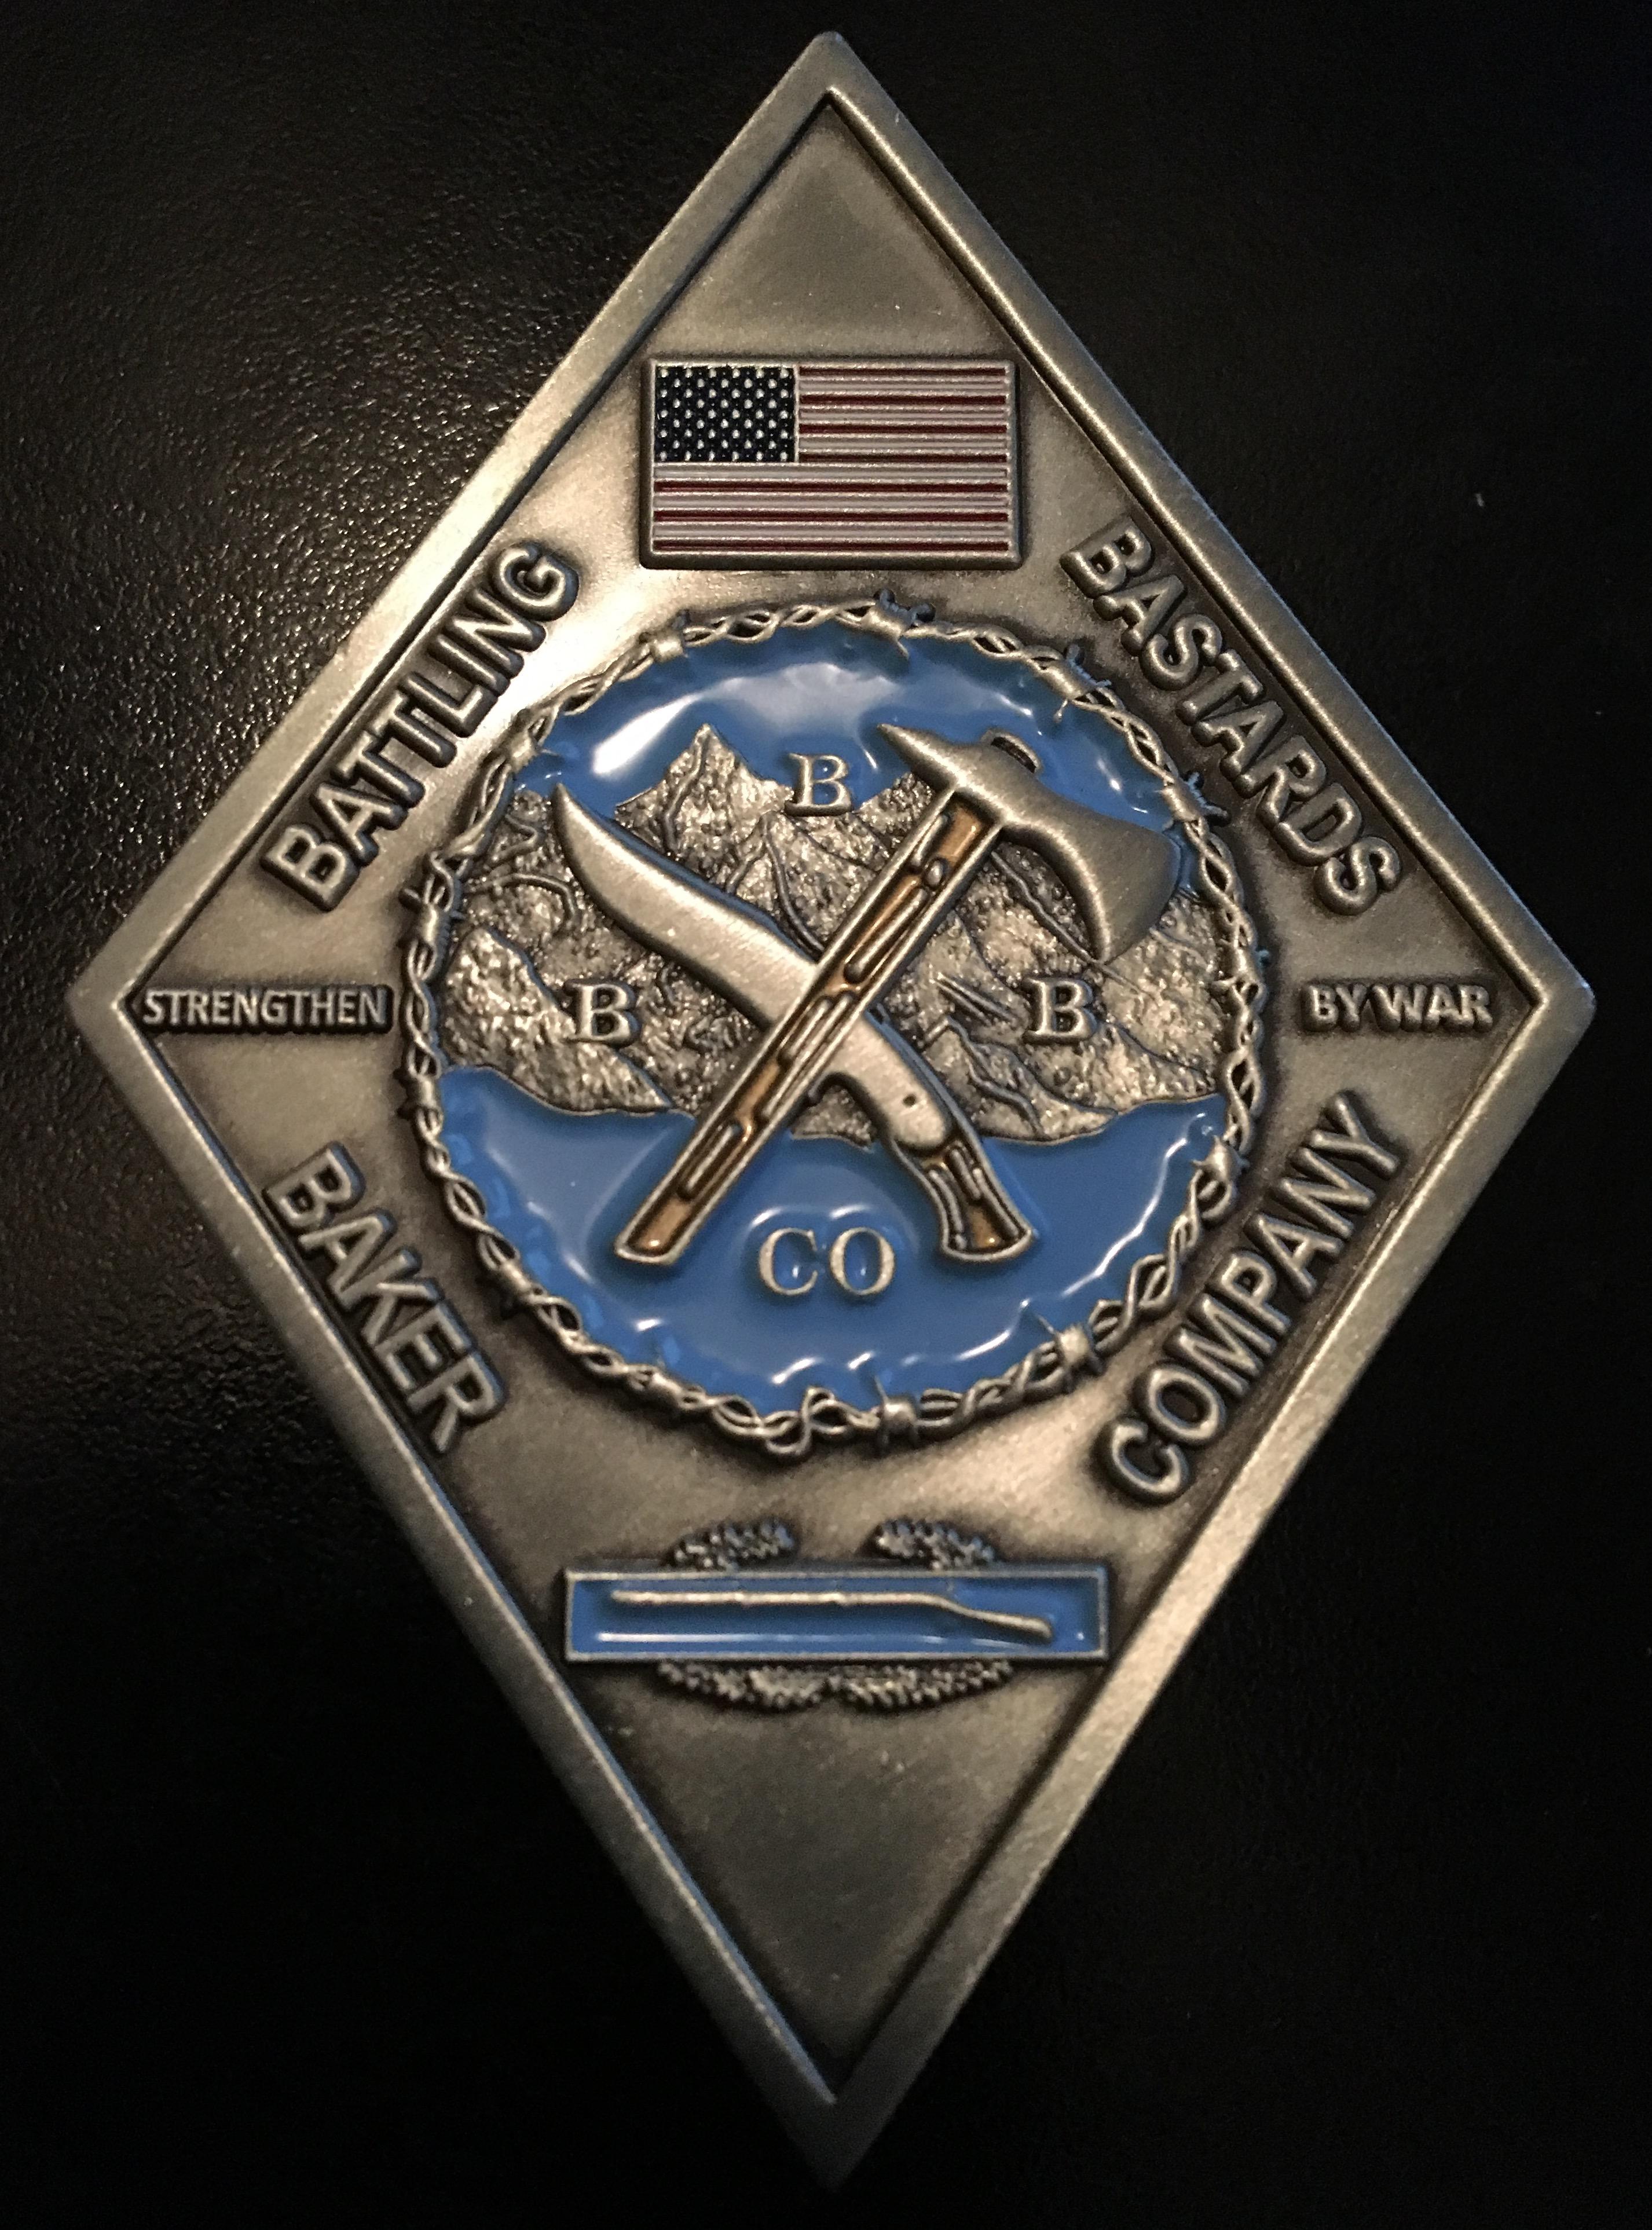 B CO 3-509 BACK